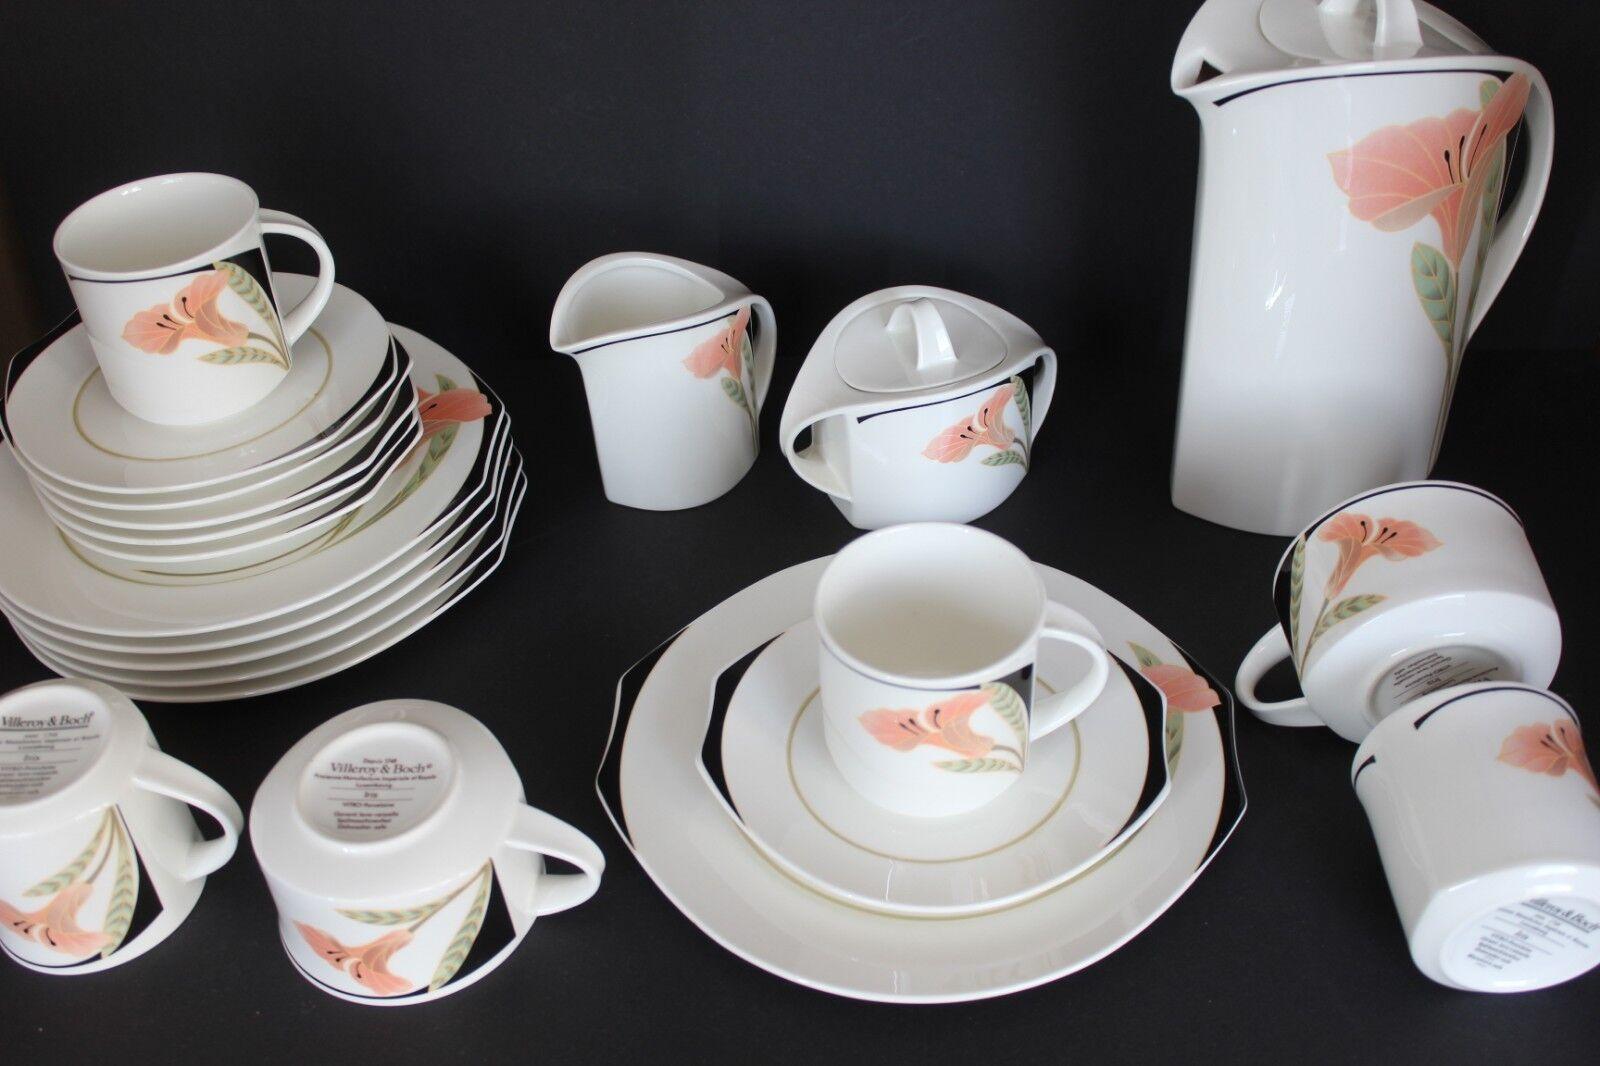 Villeroy&Boch  Iris Kaffee Teeservice für 6 Personen